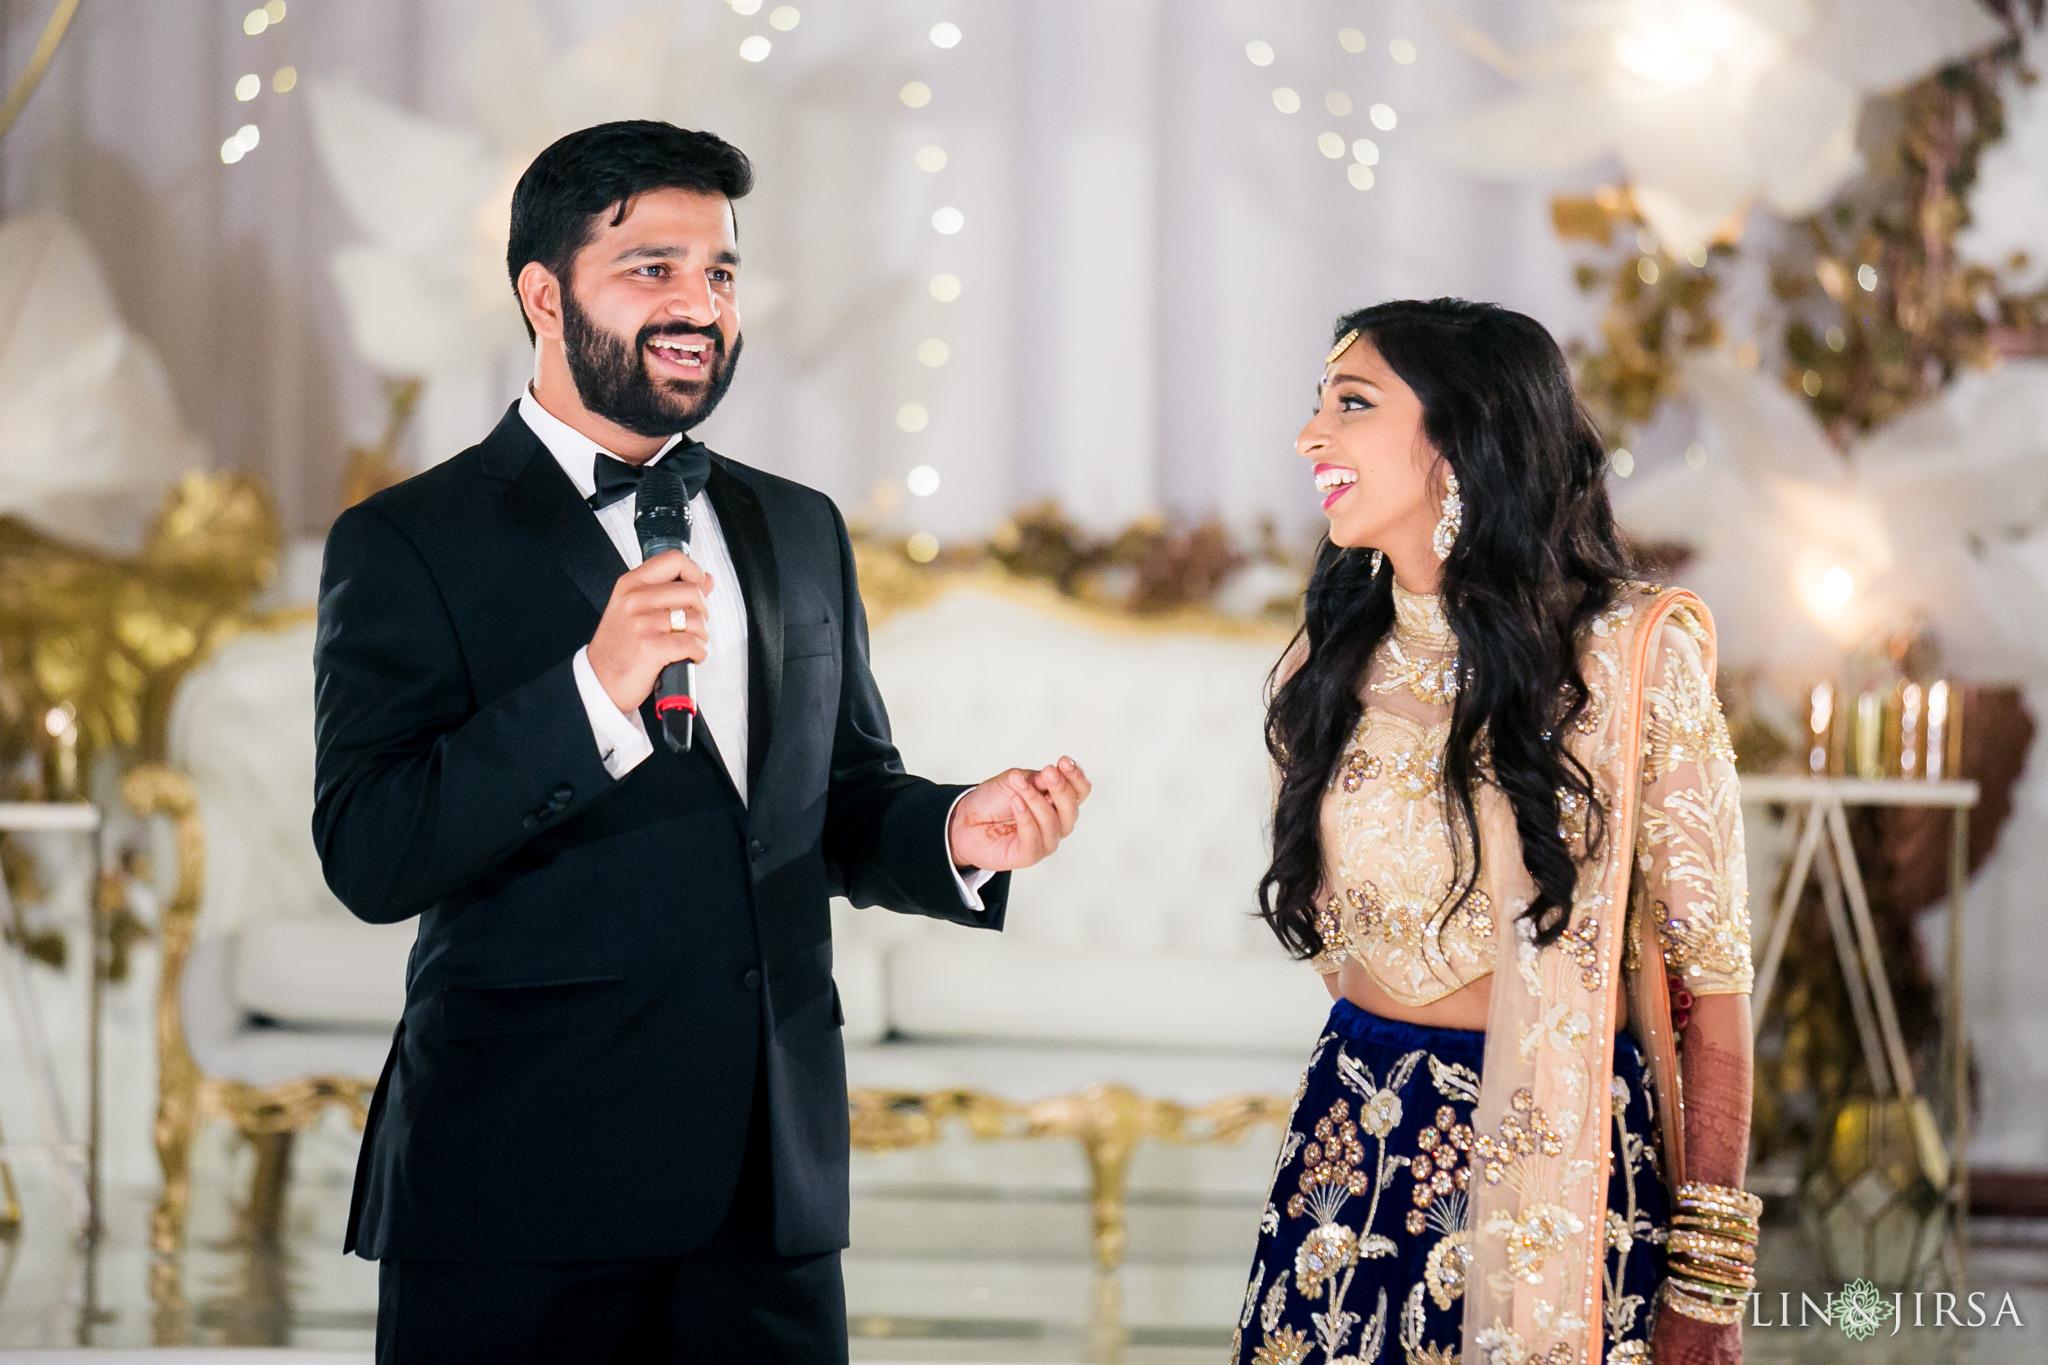 Reception Ceremony In Hindi: Huntington Beach Hyatt Regency Indian Wedding Reception